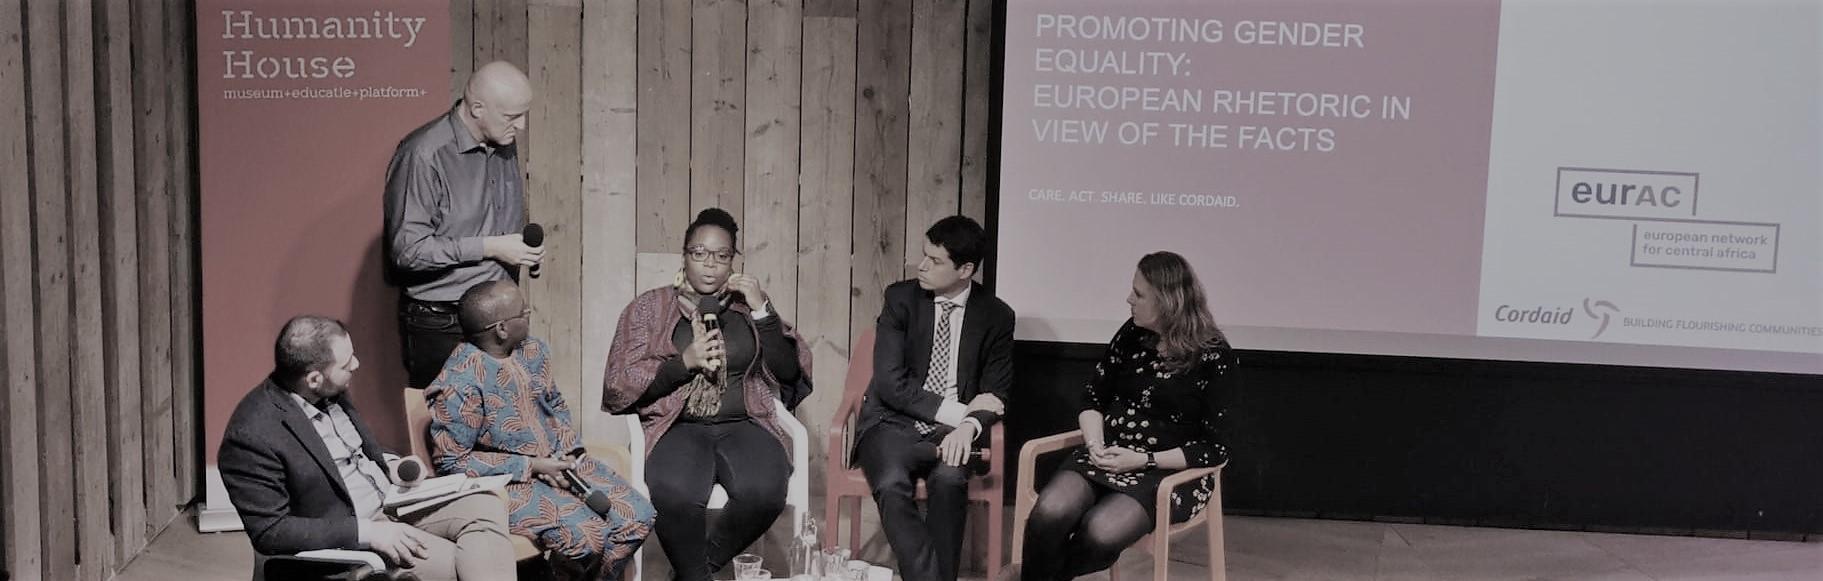 Public Conference Gender Report EurAc